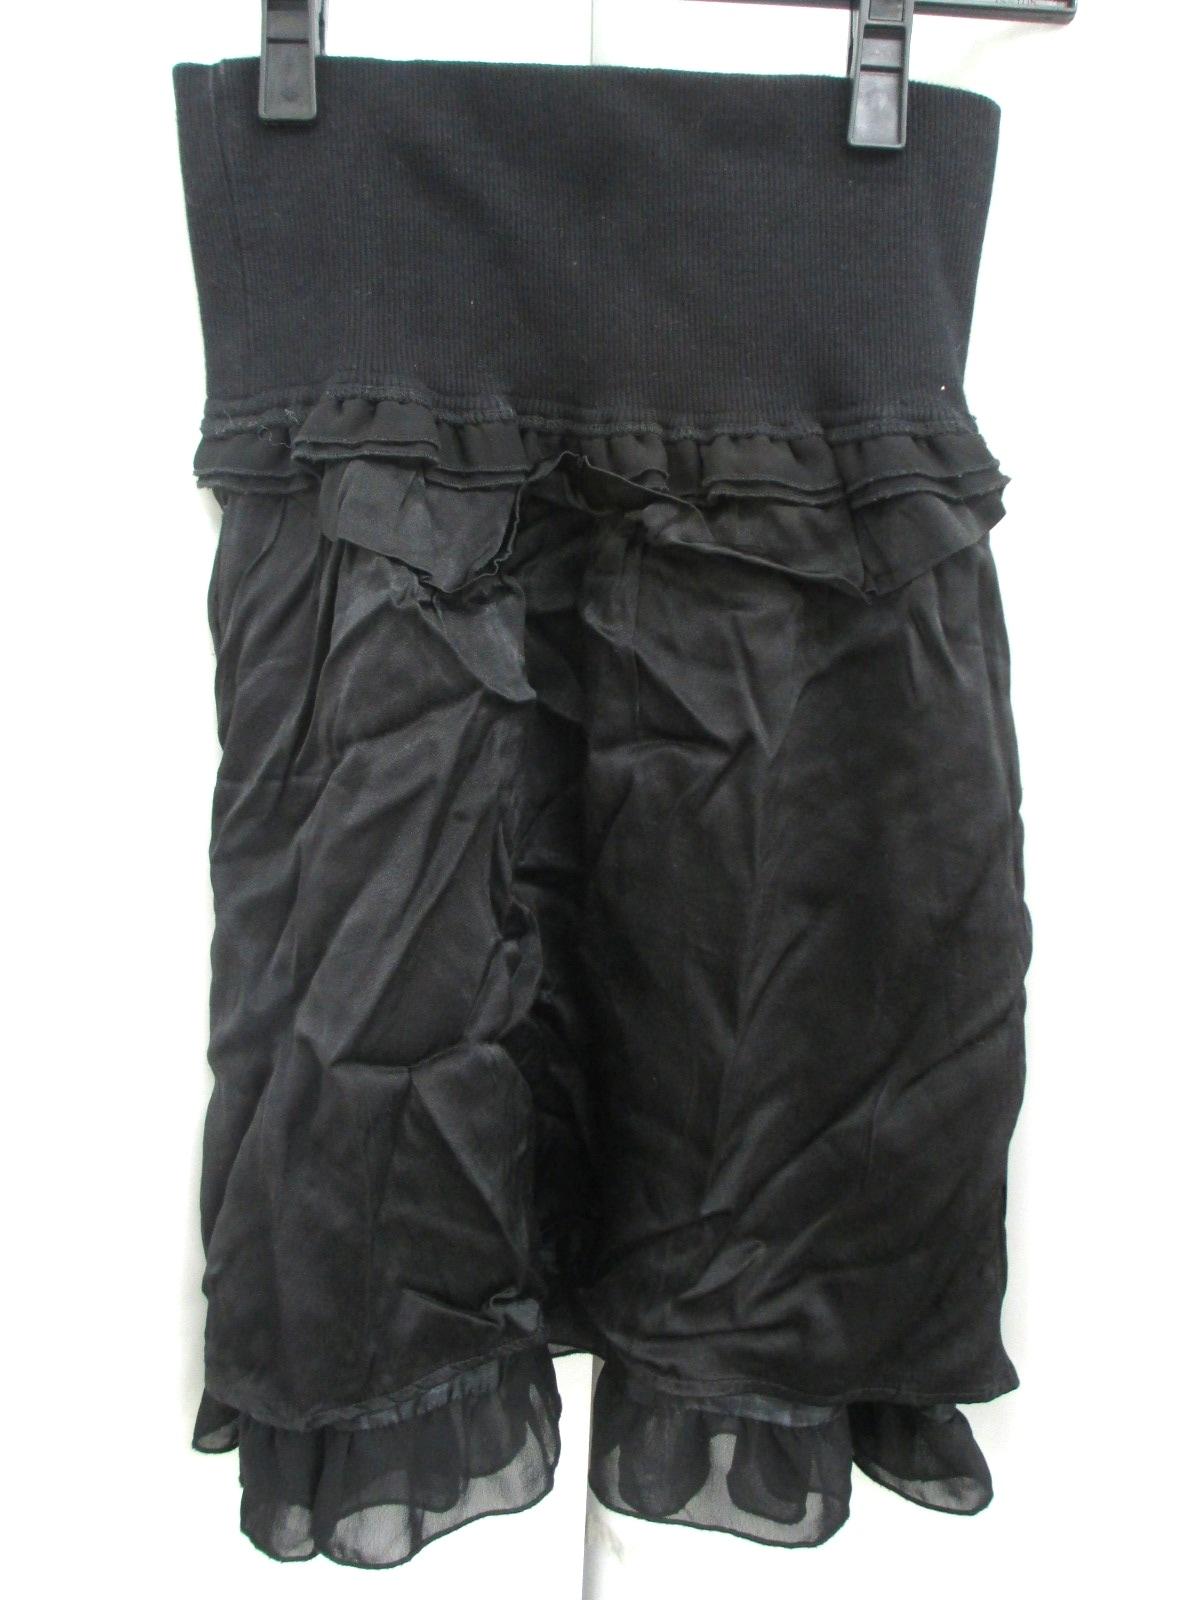 KOOKS&CHELICA(クークスアンドチェリカ)のスカート